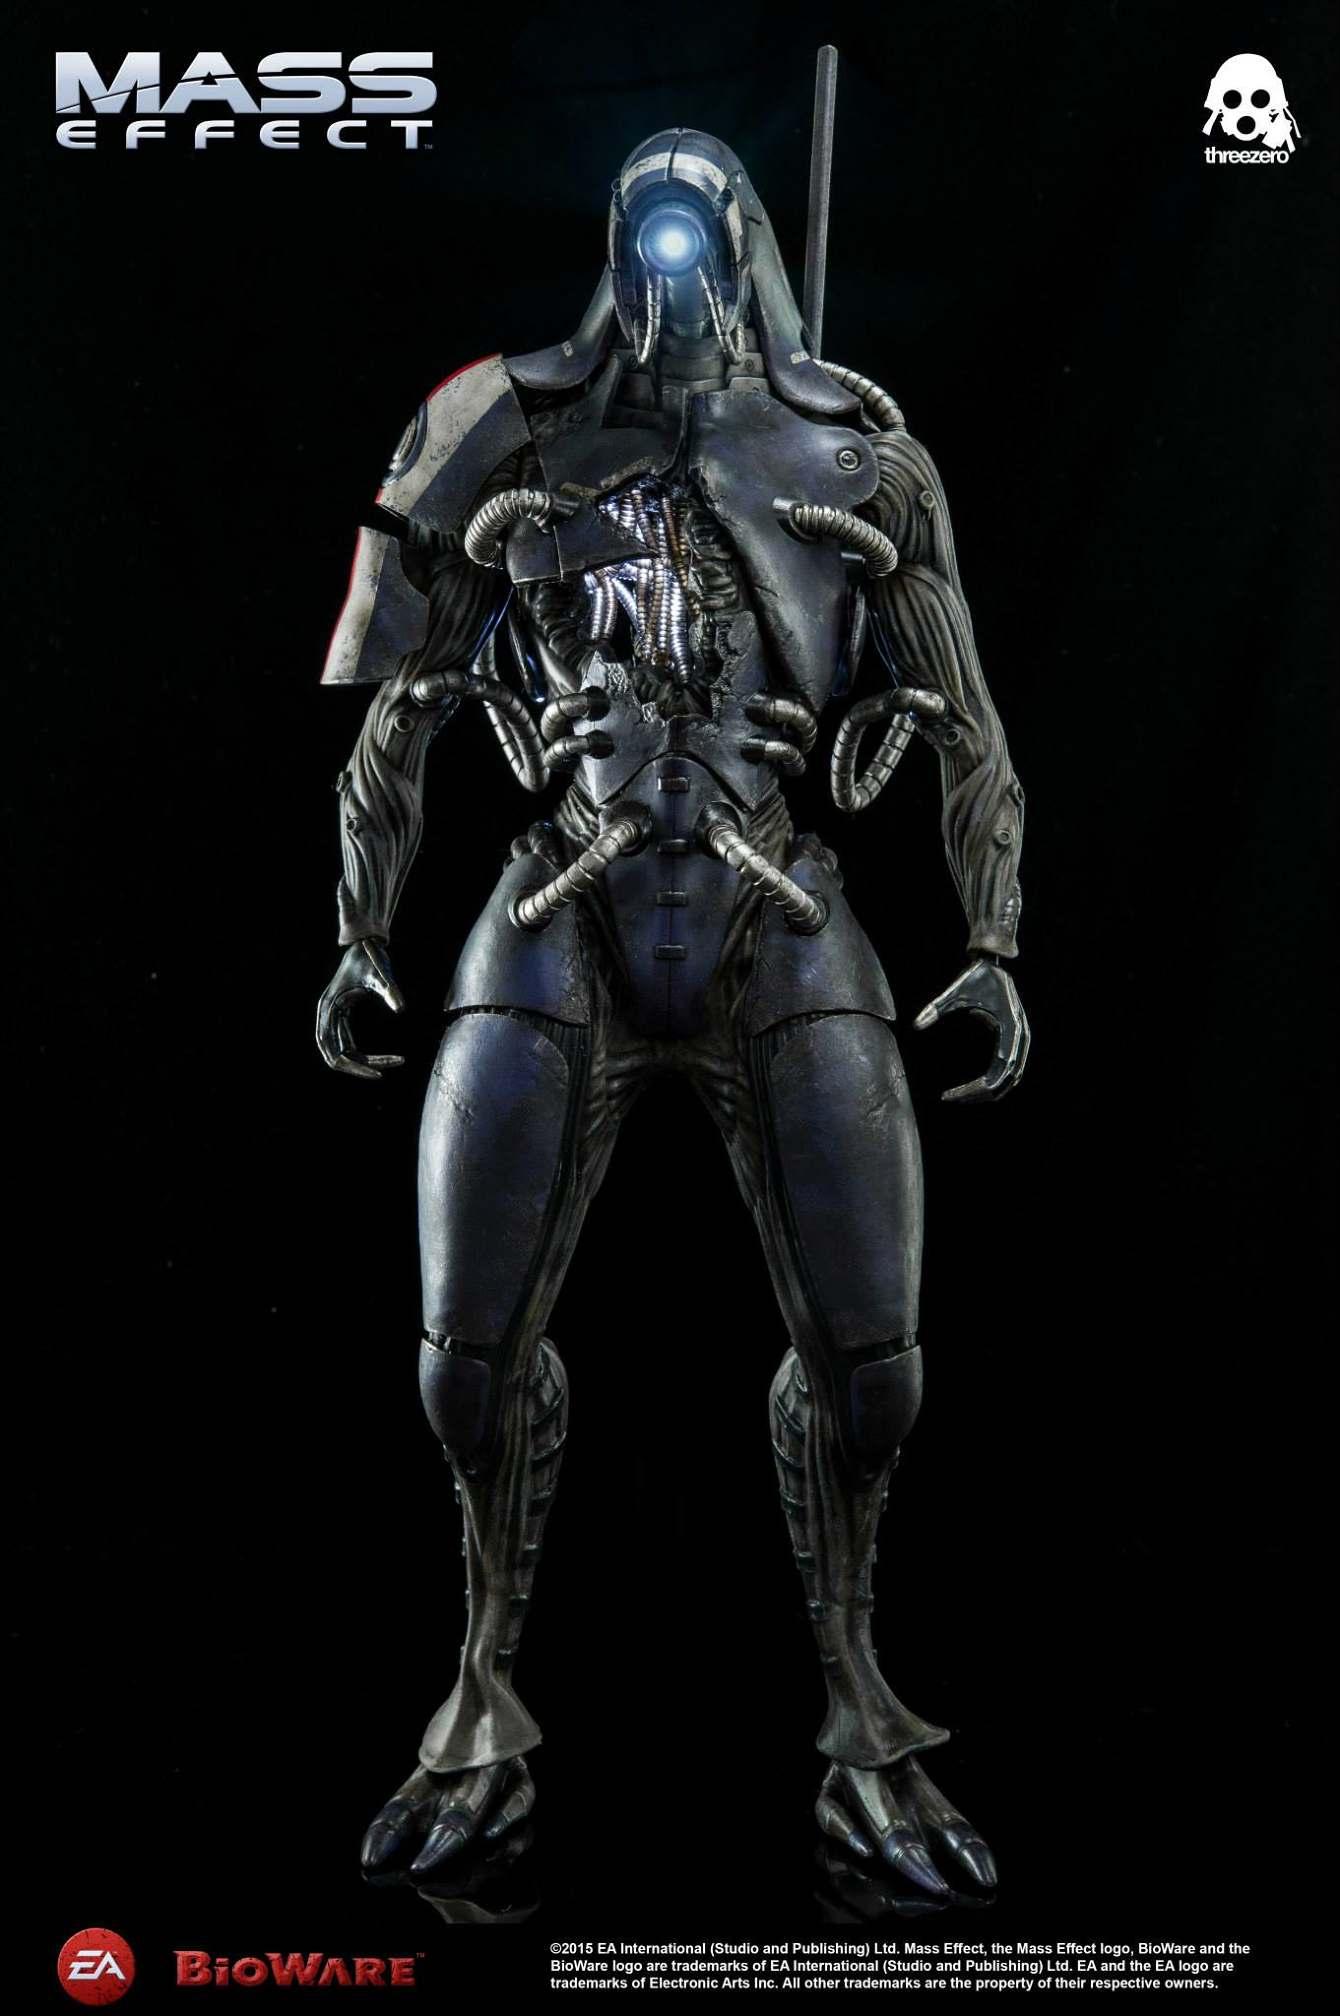 ThreeZero-Bioware-video-game-Legion-Mass-Effect-figure-11_1340_c.jpg